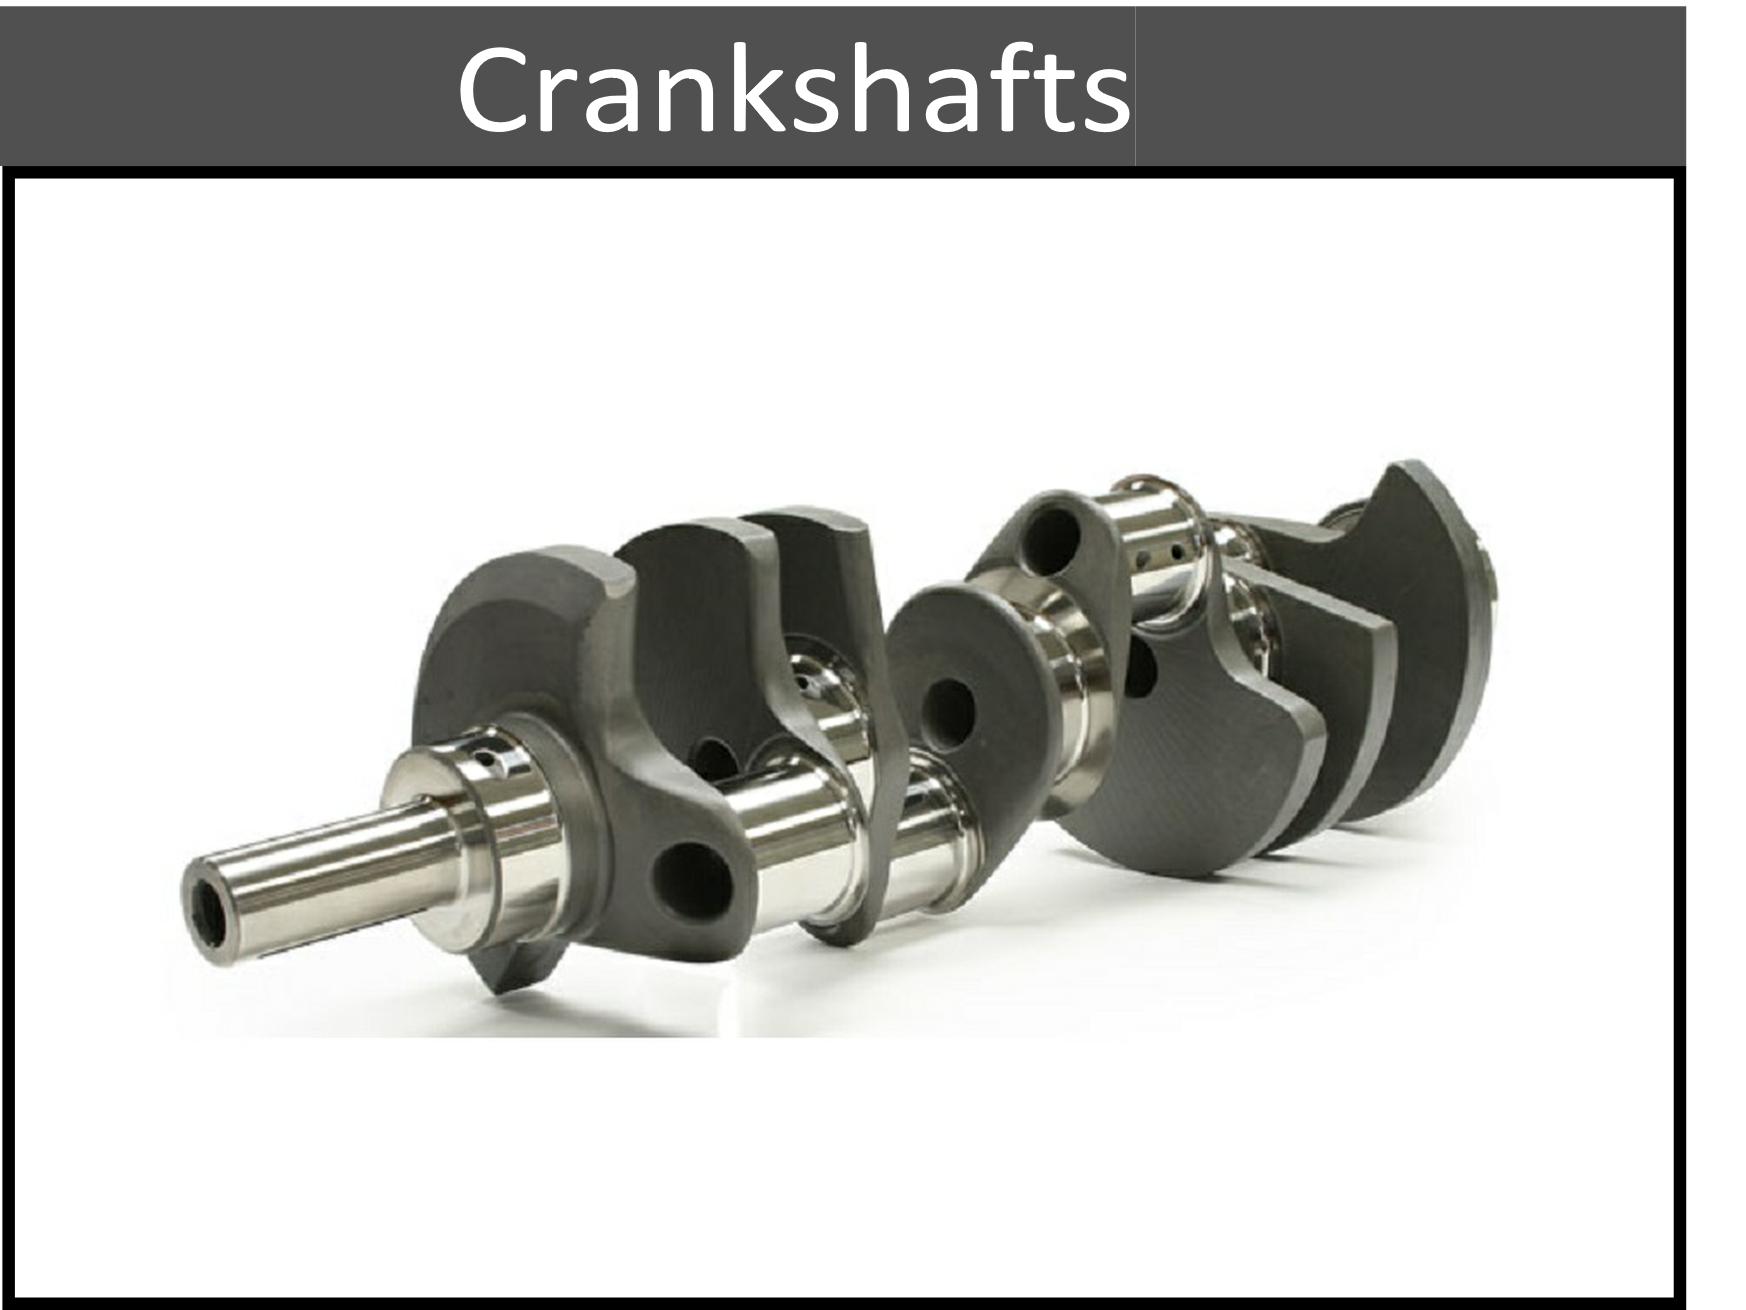 Replacement Crankshafts